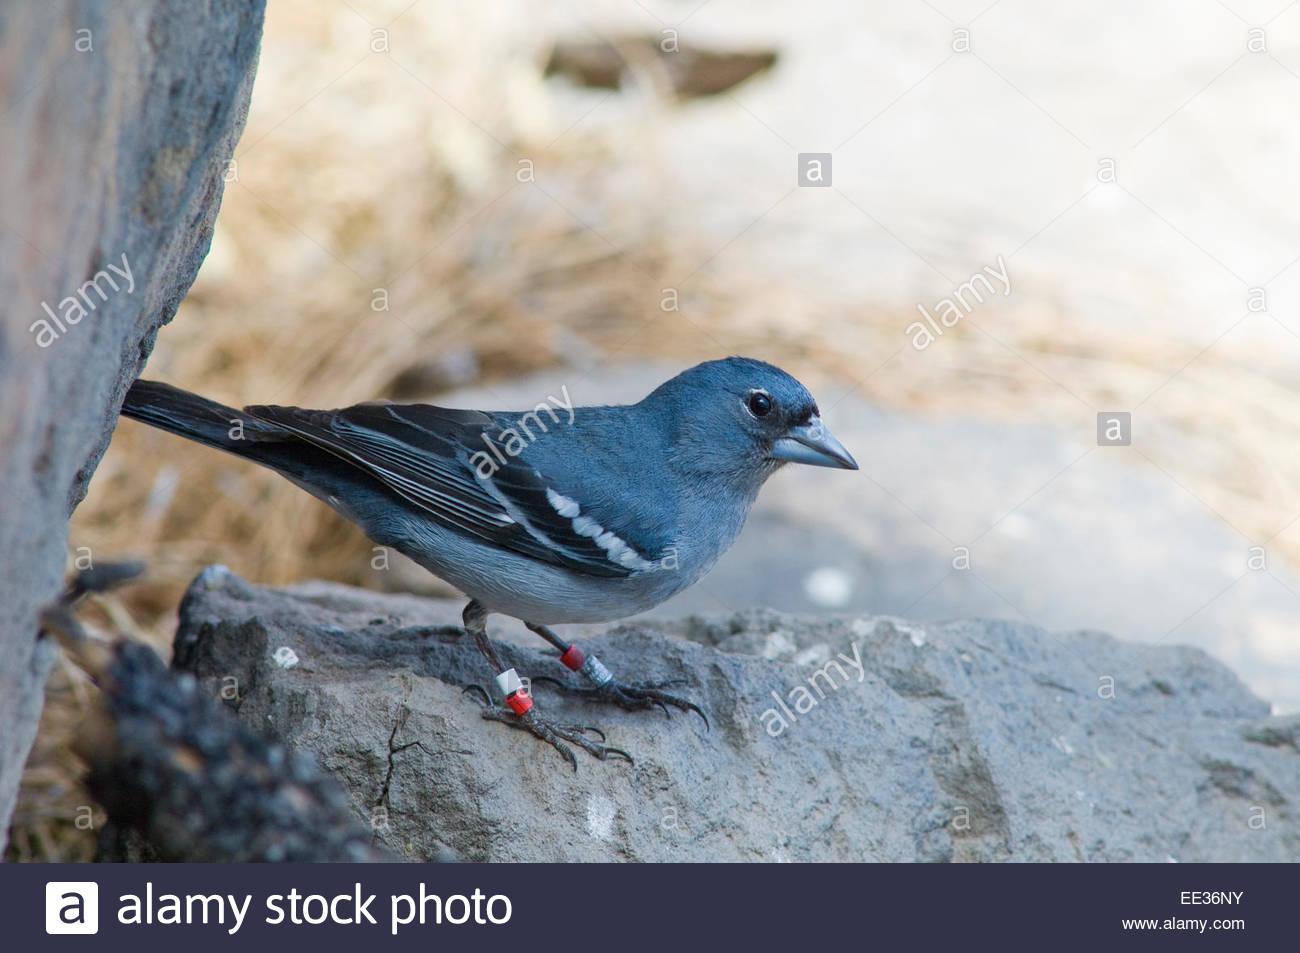 Gran Canaria blue chaffinch (Fringilla teydea polatzeki). Adult male. Stock Photo